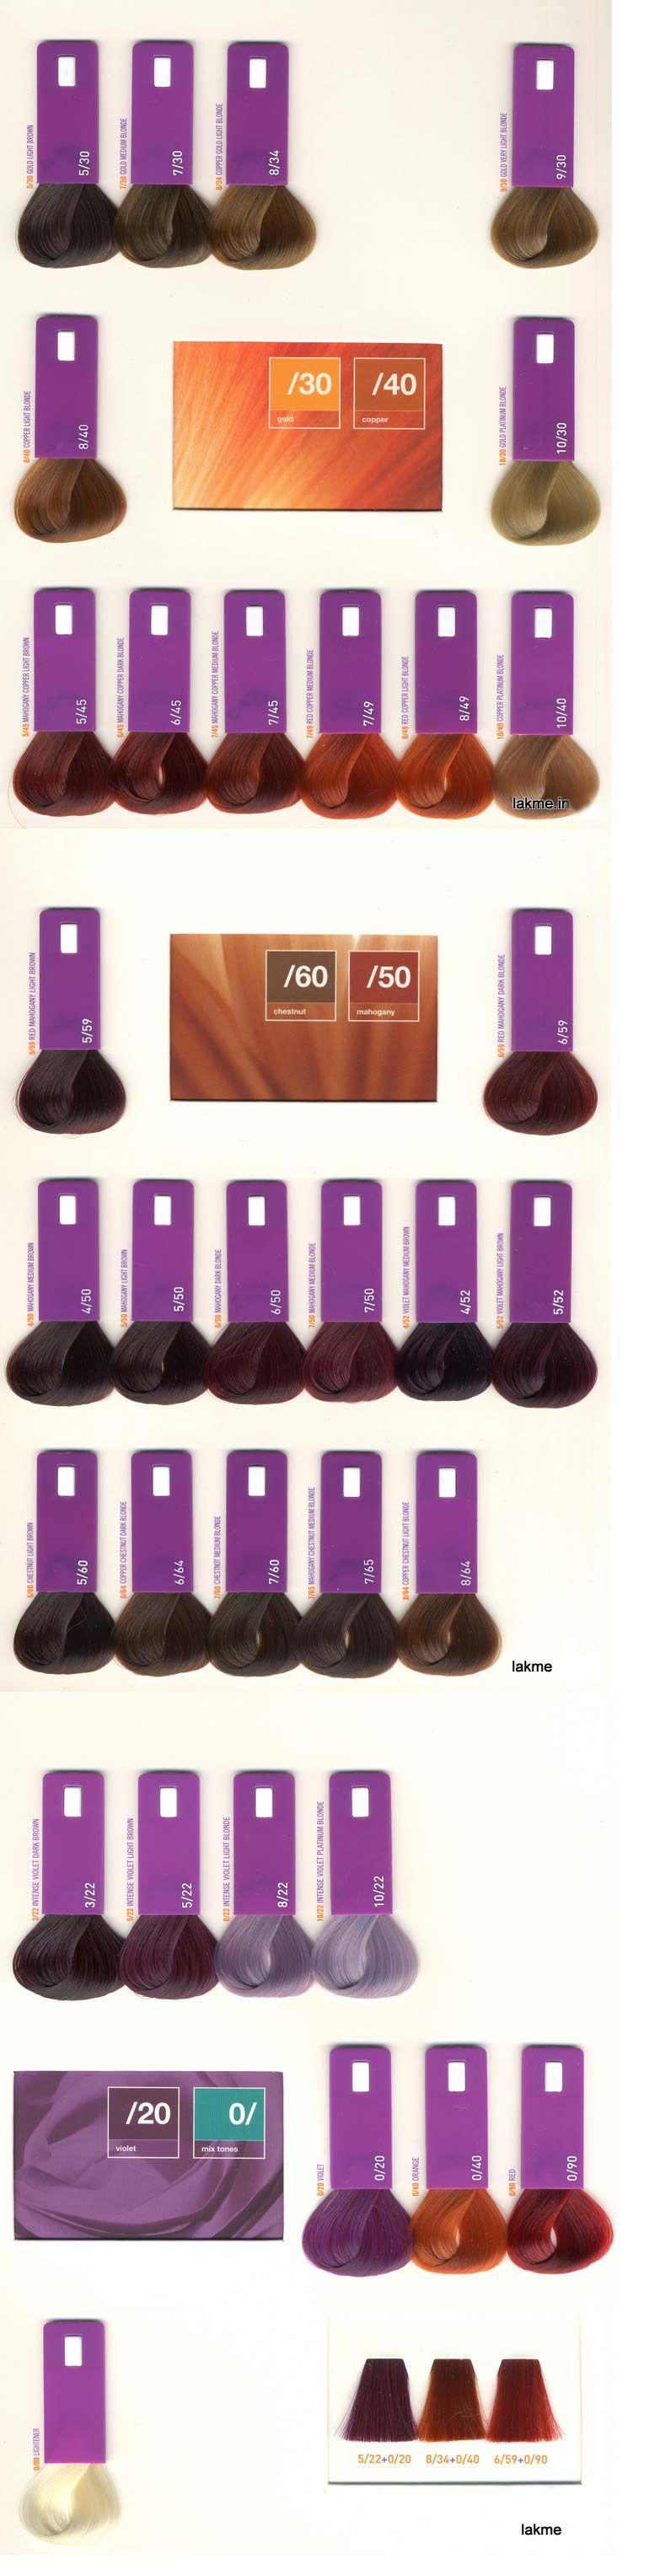 L'oreal Professional Inoa Hair Colour Chart | Hair color formulas ...